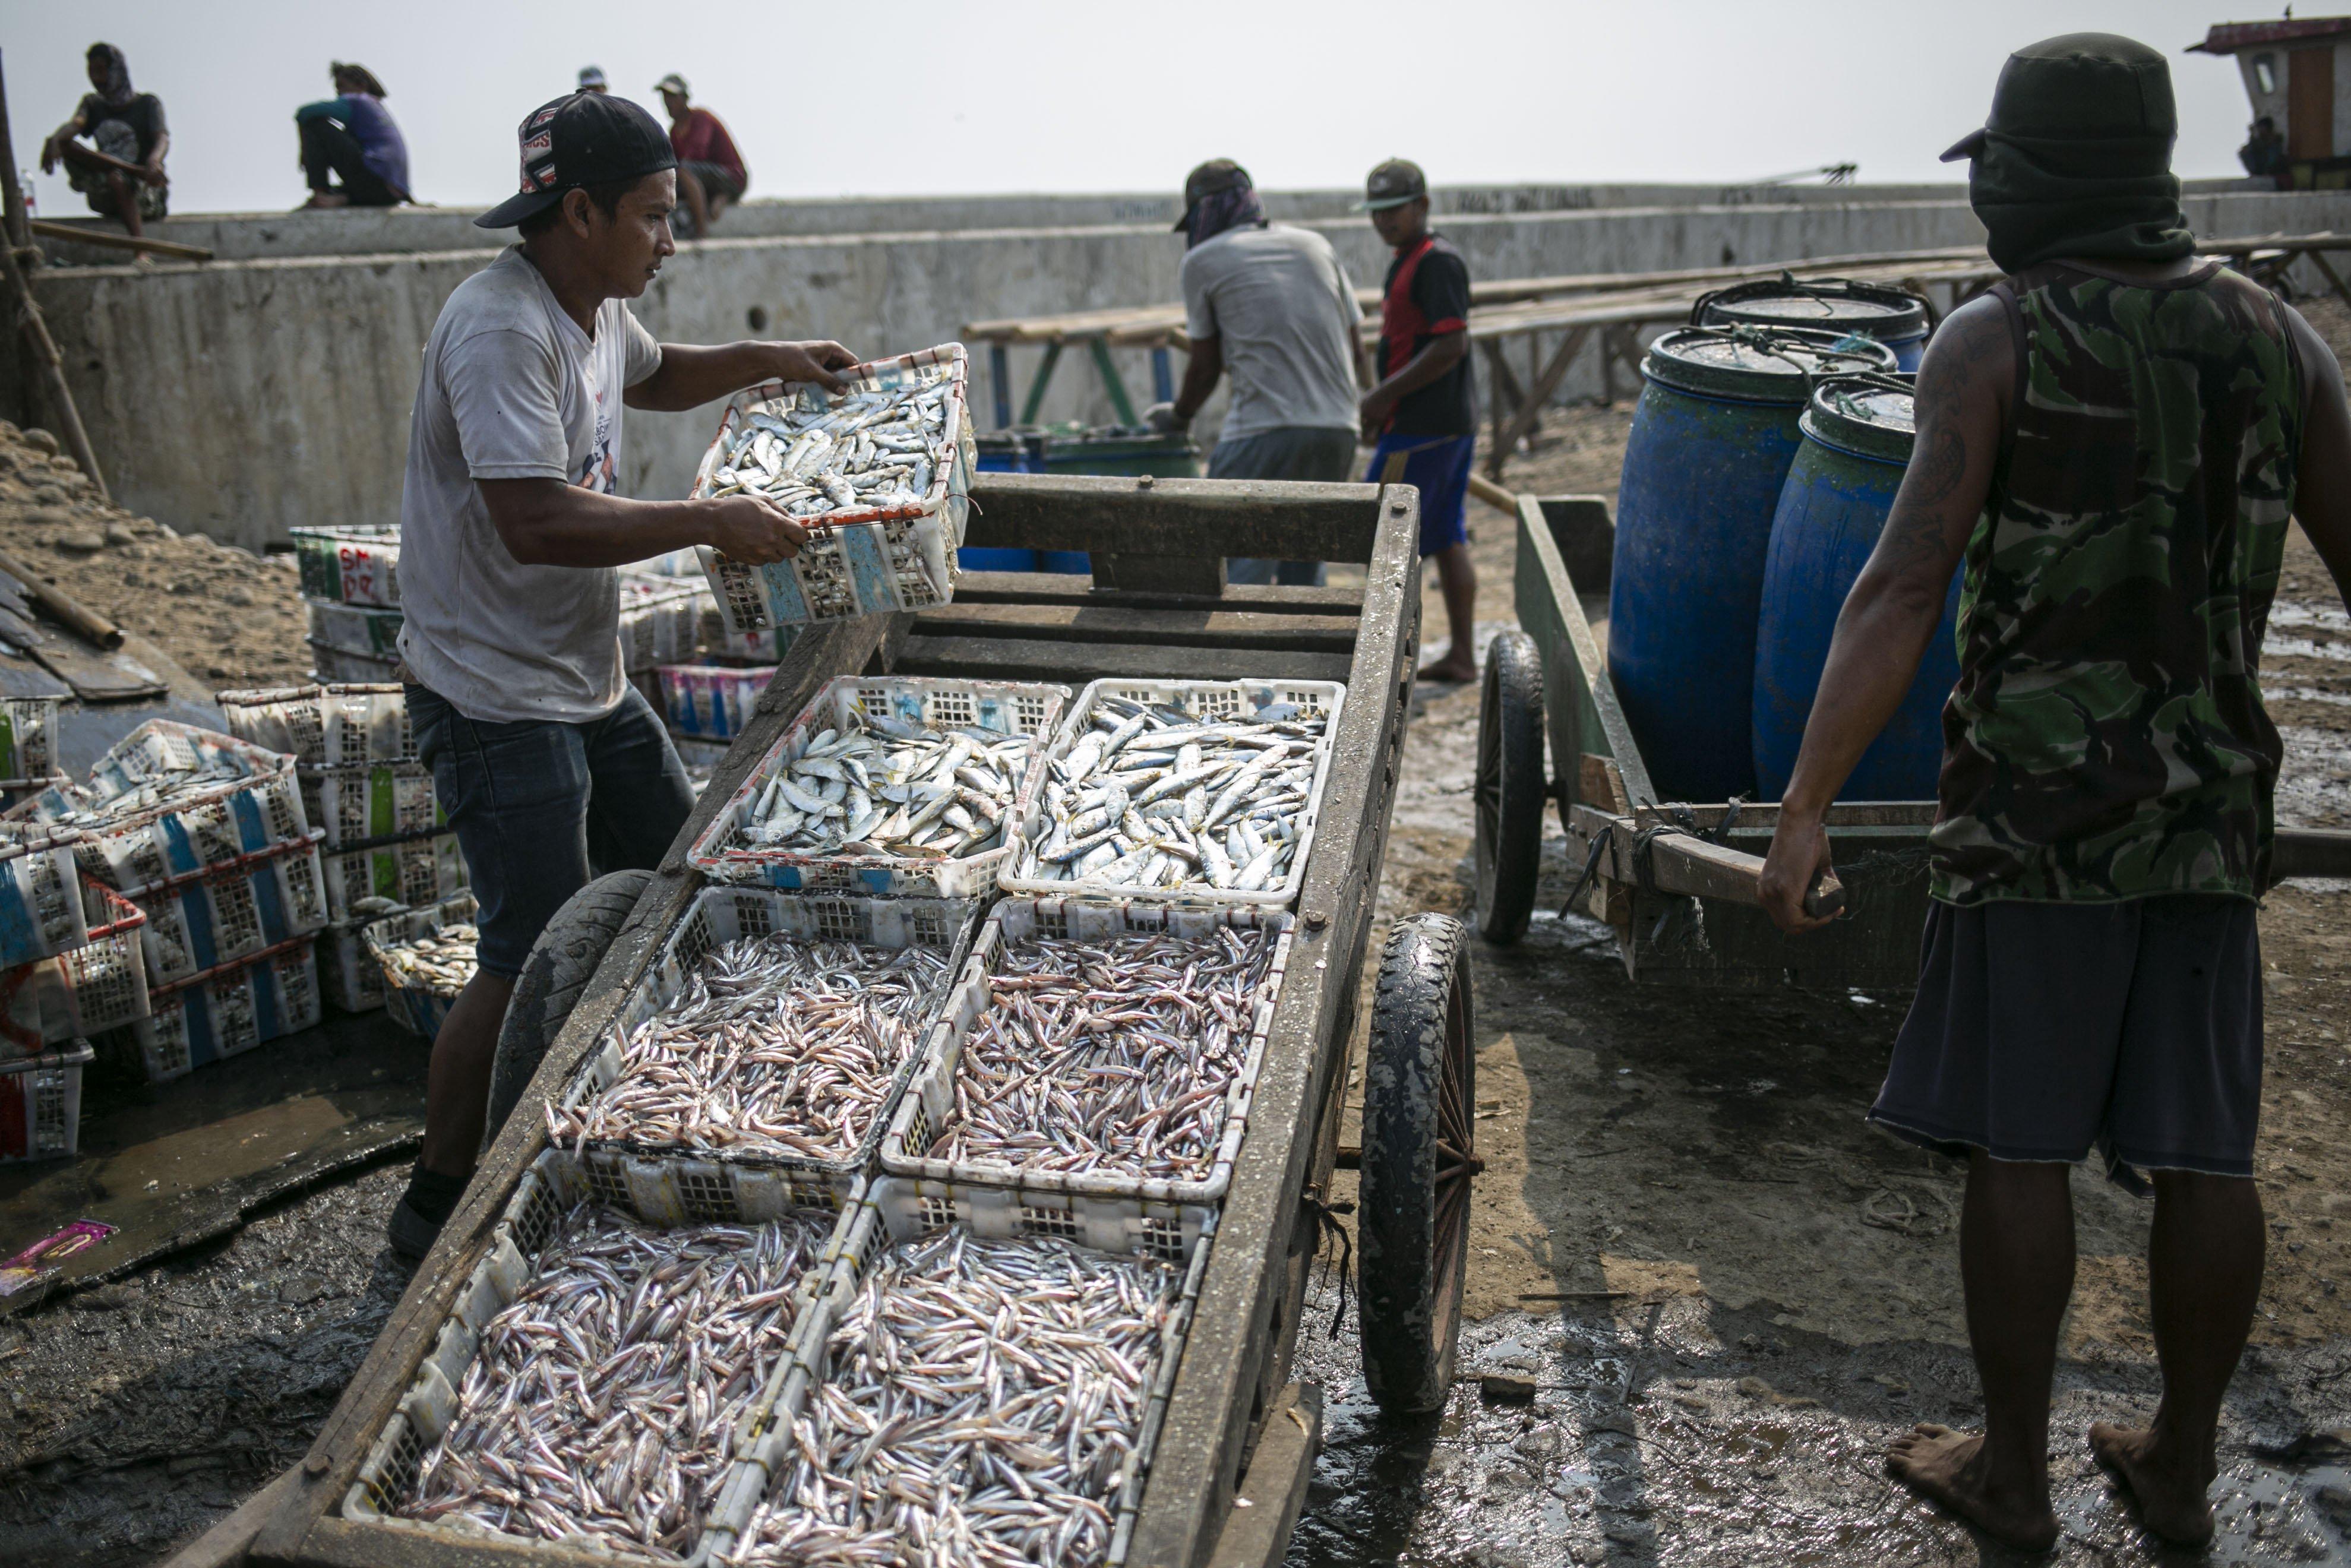 Sejumlah nelayan memilah ikan hasil tangkapan di Kampung Nelayan, Jakarta Utara, Minggu (9/8/2020). Kesatuan Nelayan Tradisional Indonesia (KNTI) mengklaim penurunan penjualan tangkapan nelayan mencapai 21 persen dan pendapatan hingga 90 persen akibat merebaknya virus covid-19.